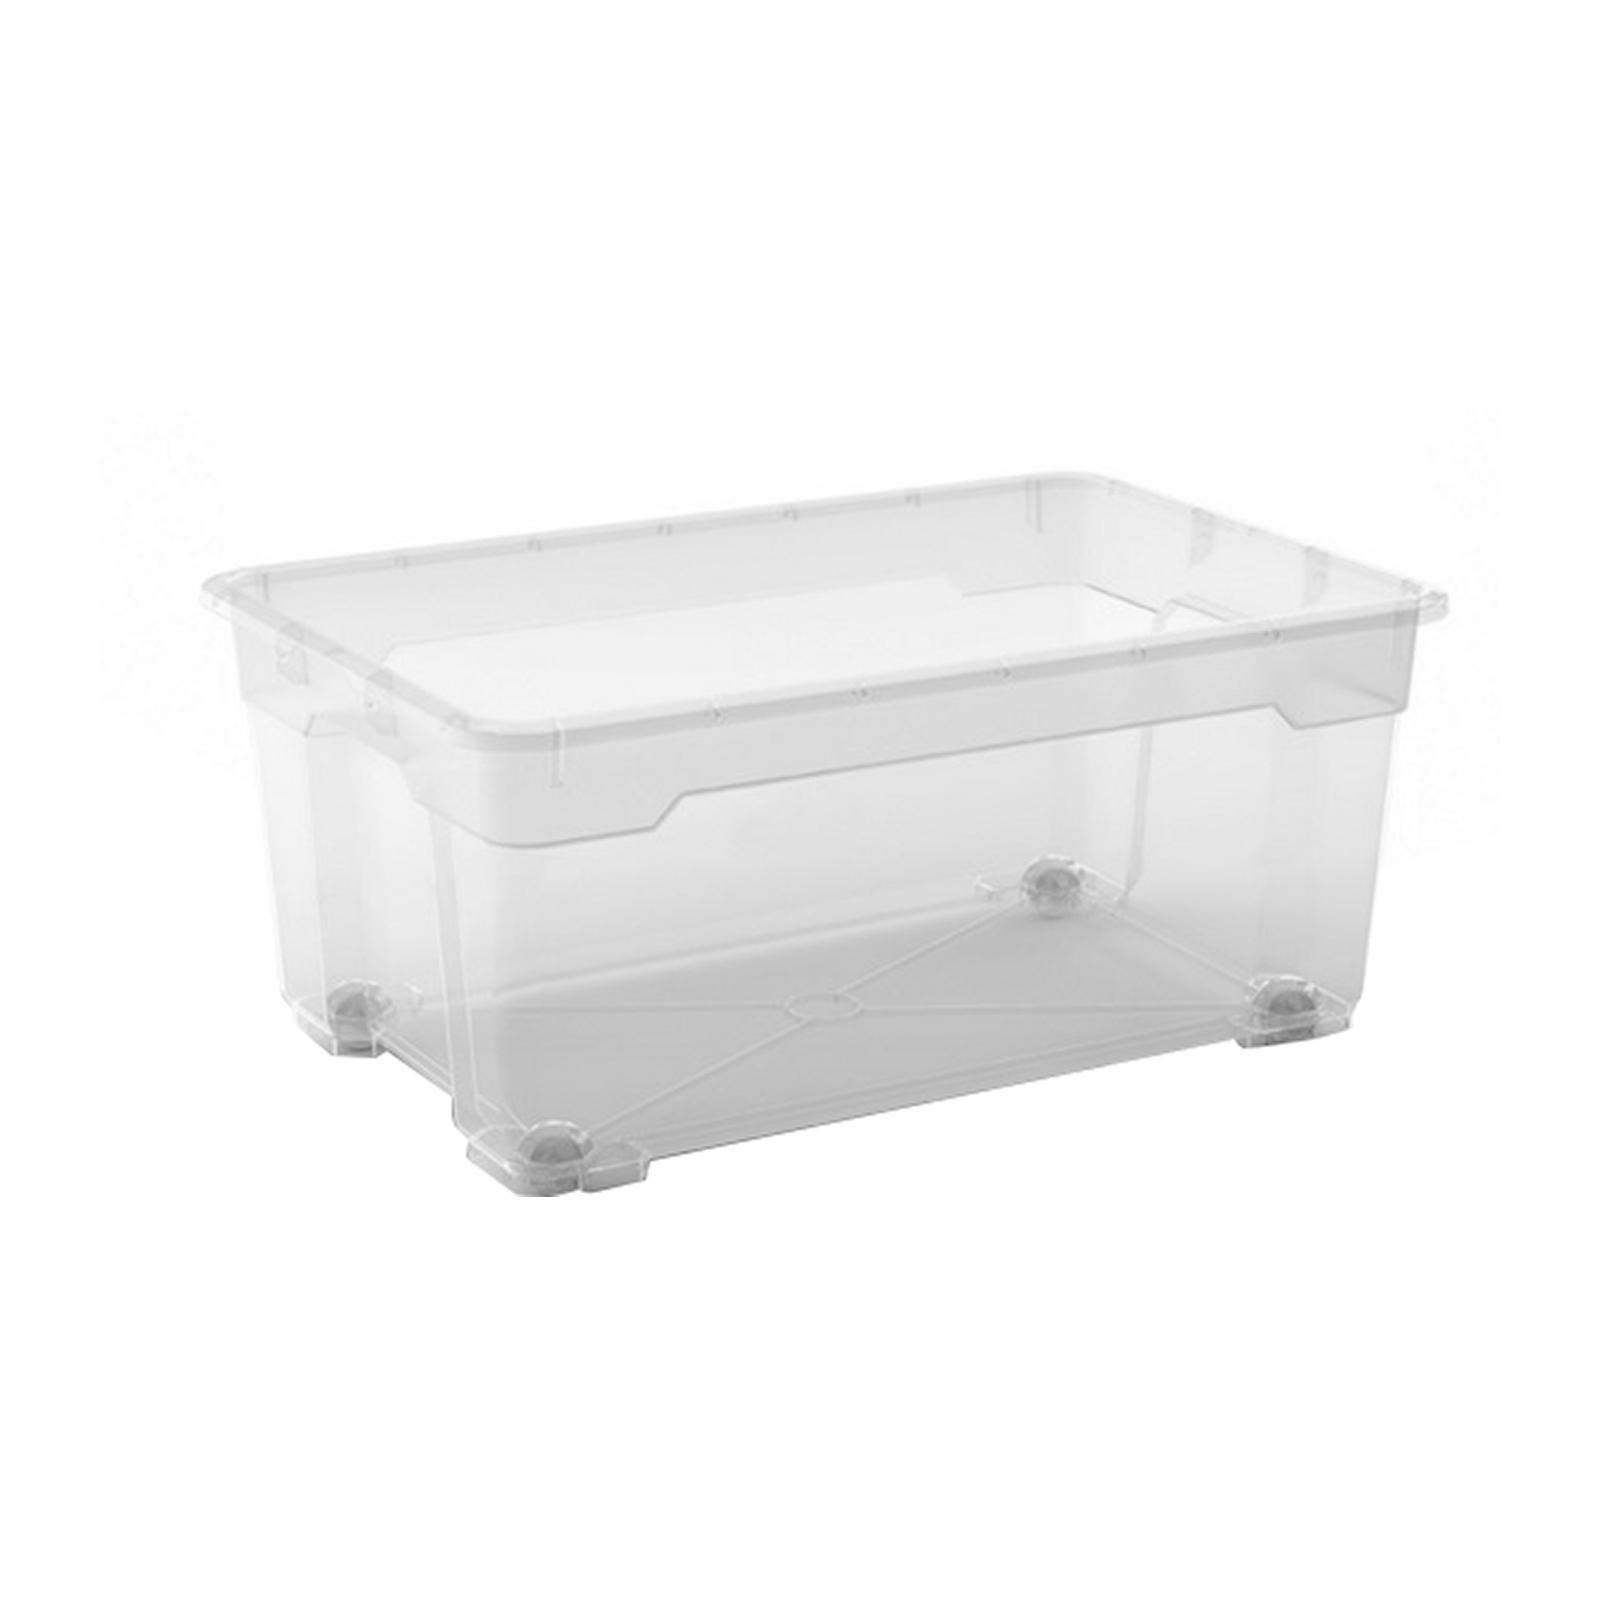 KIS Clear Storage R Box L With Lid